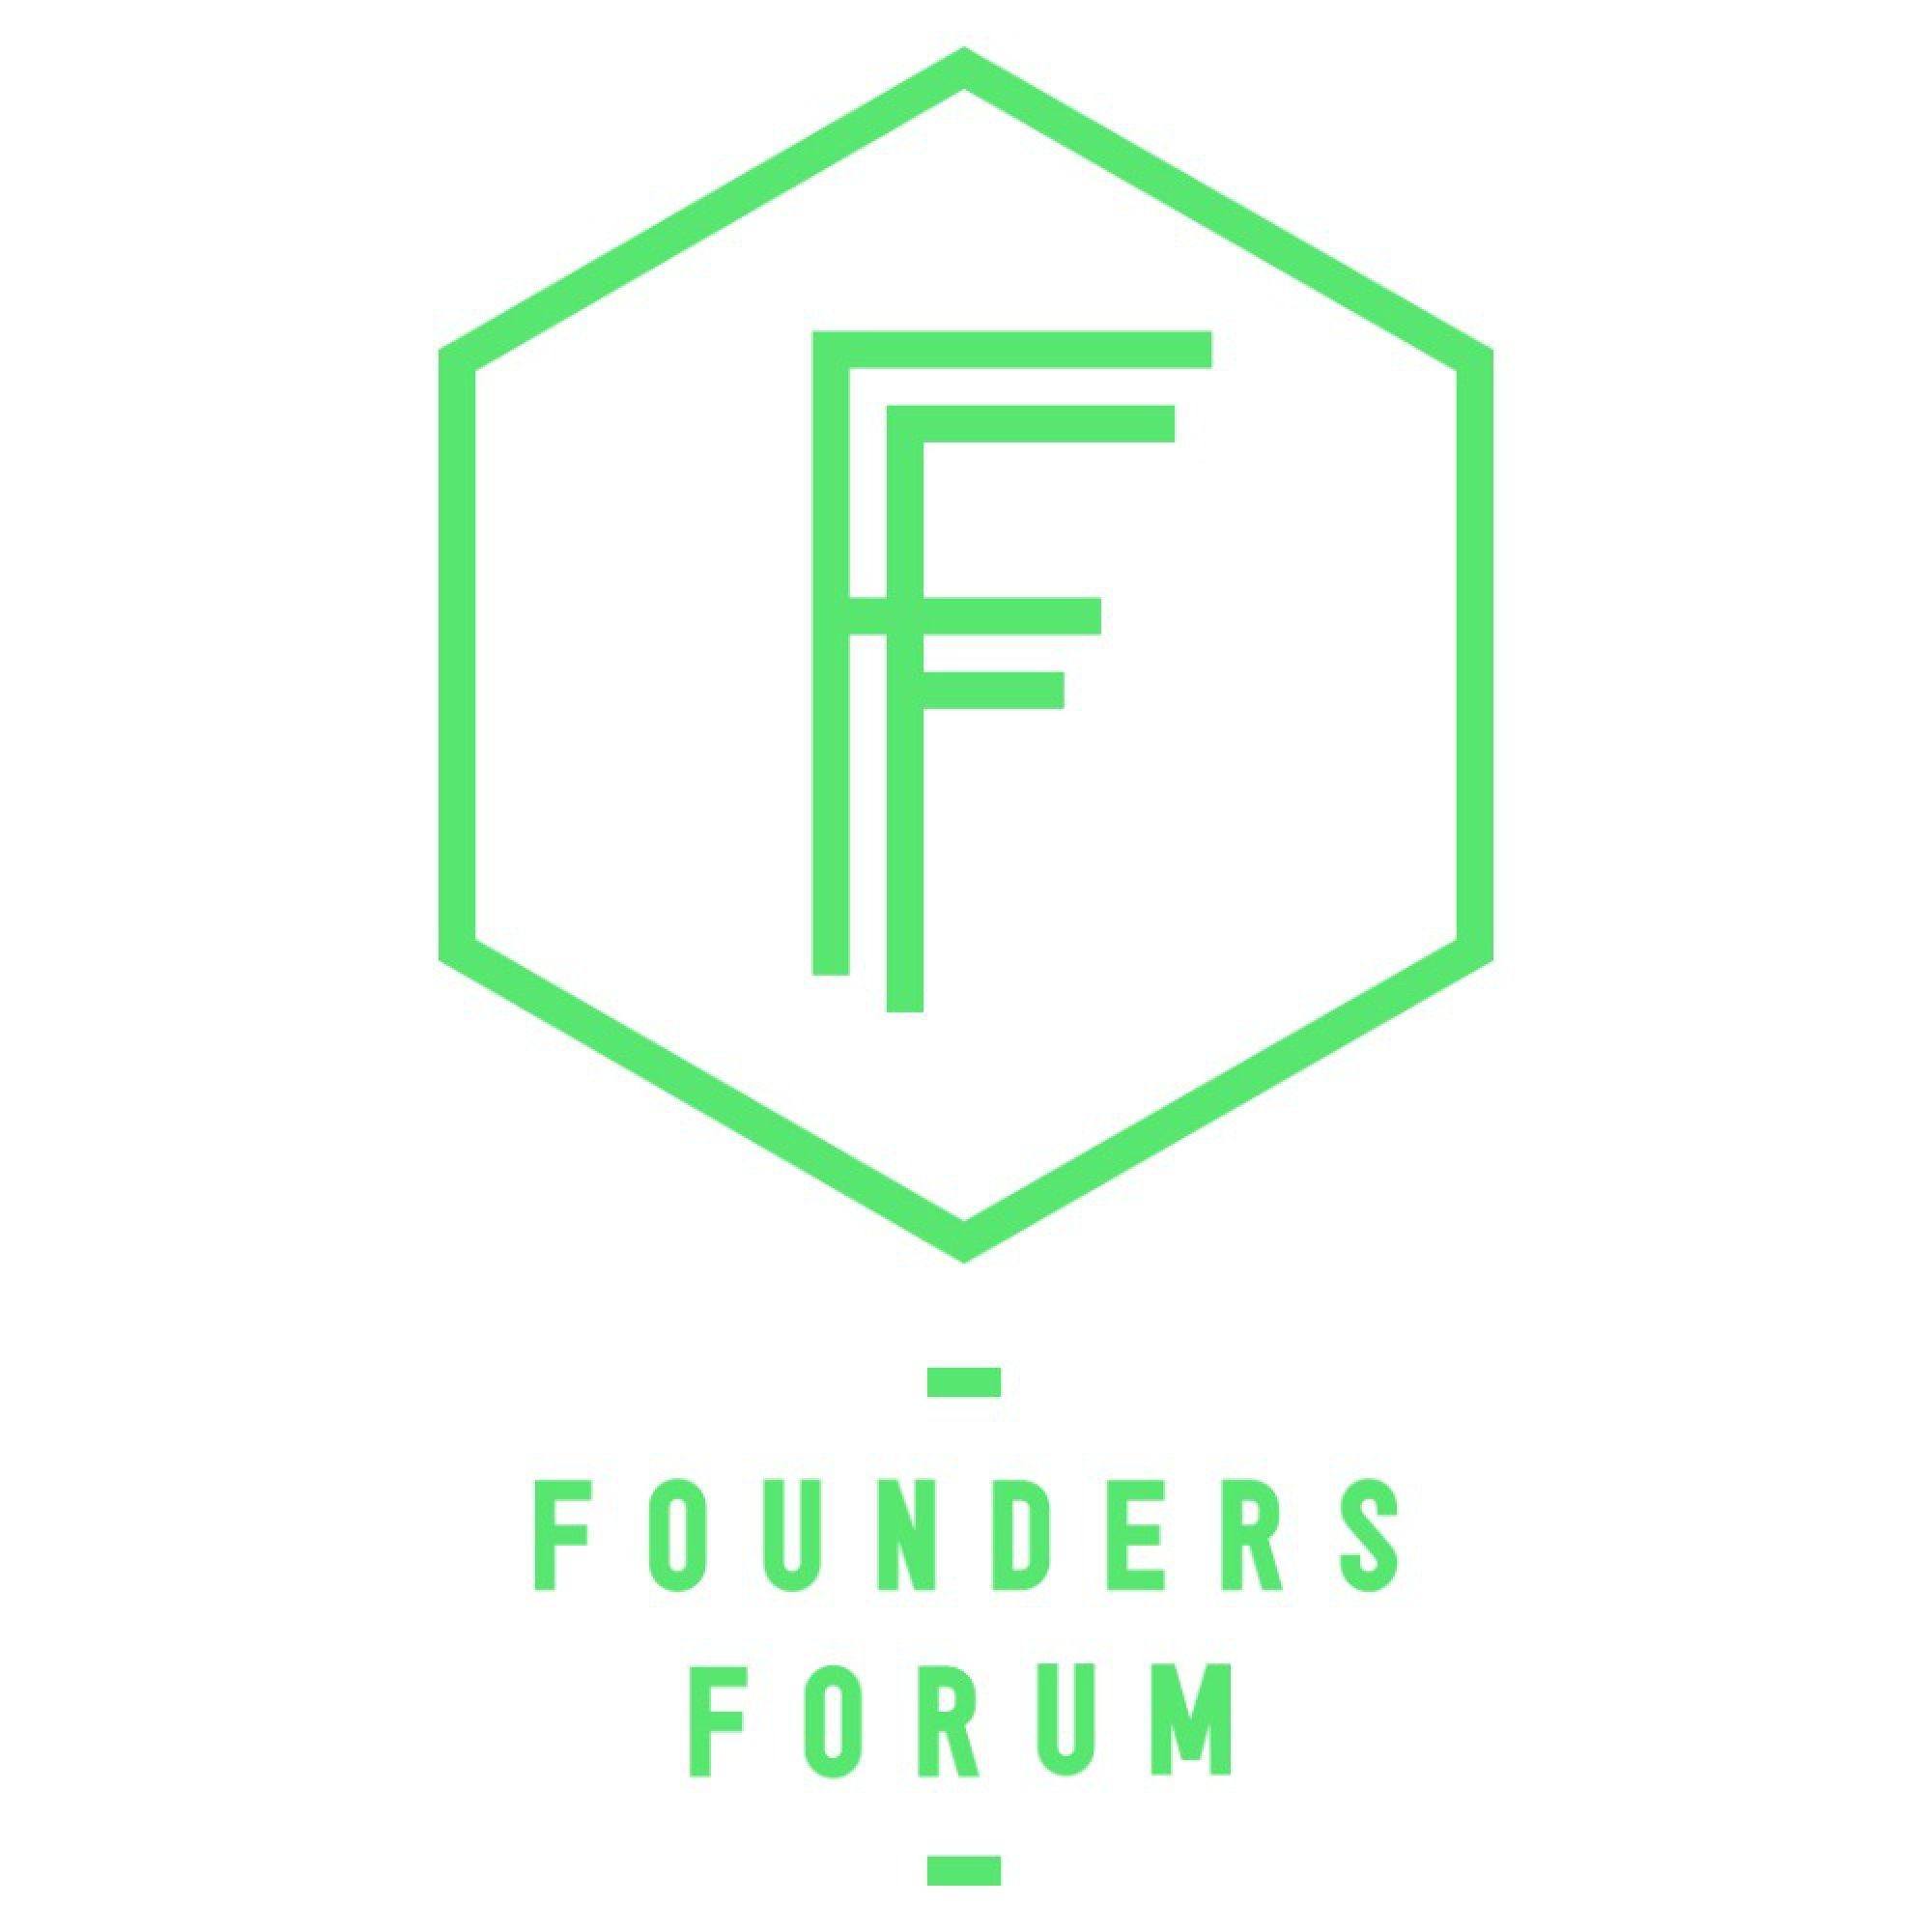 founders-forum-logo.jpg